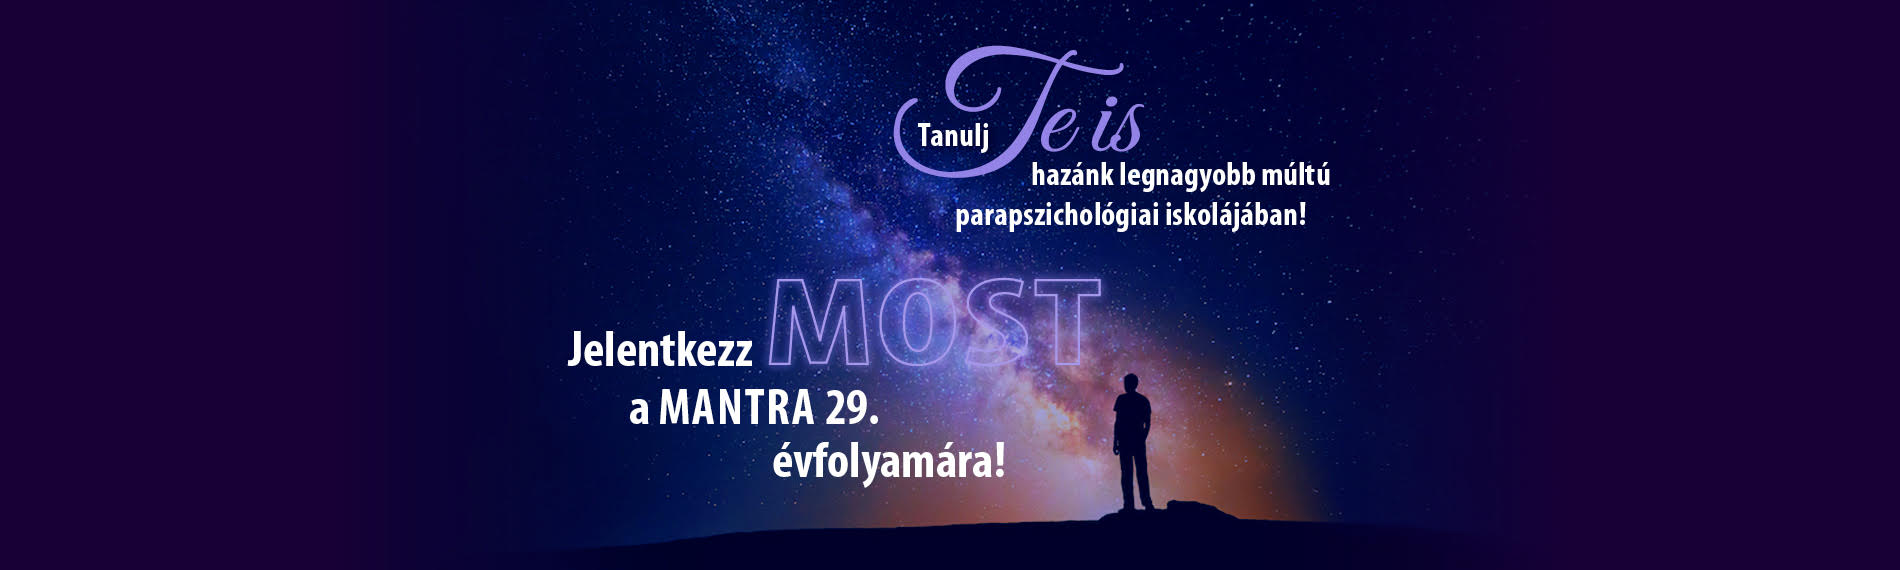 mantra_2021